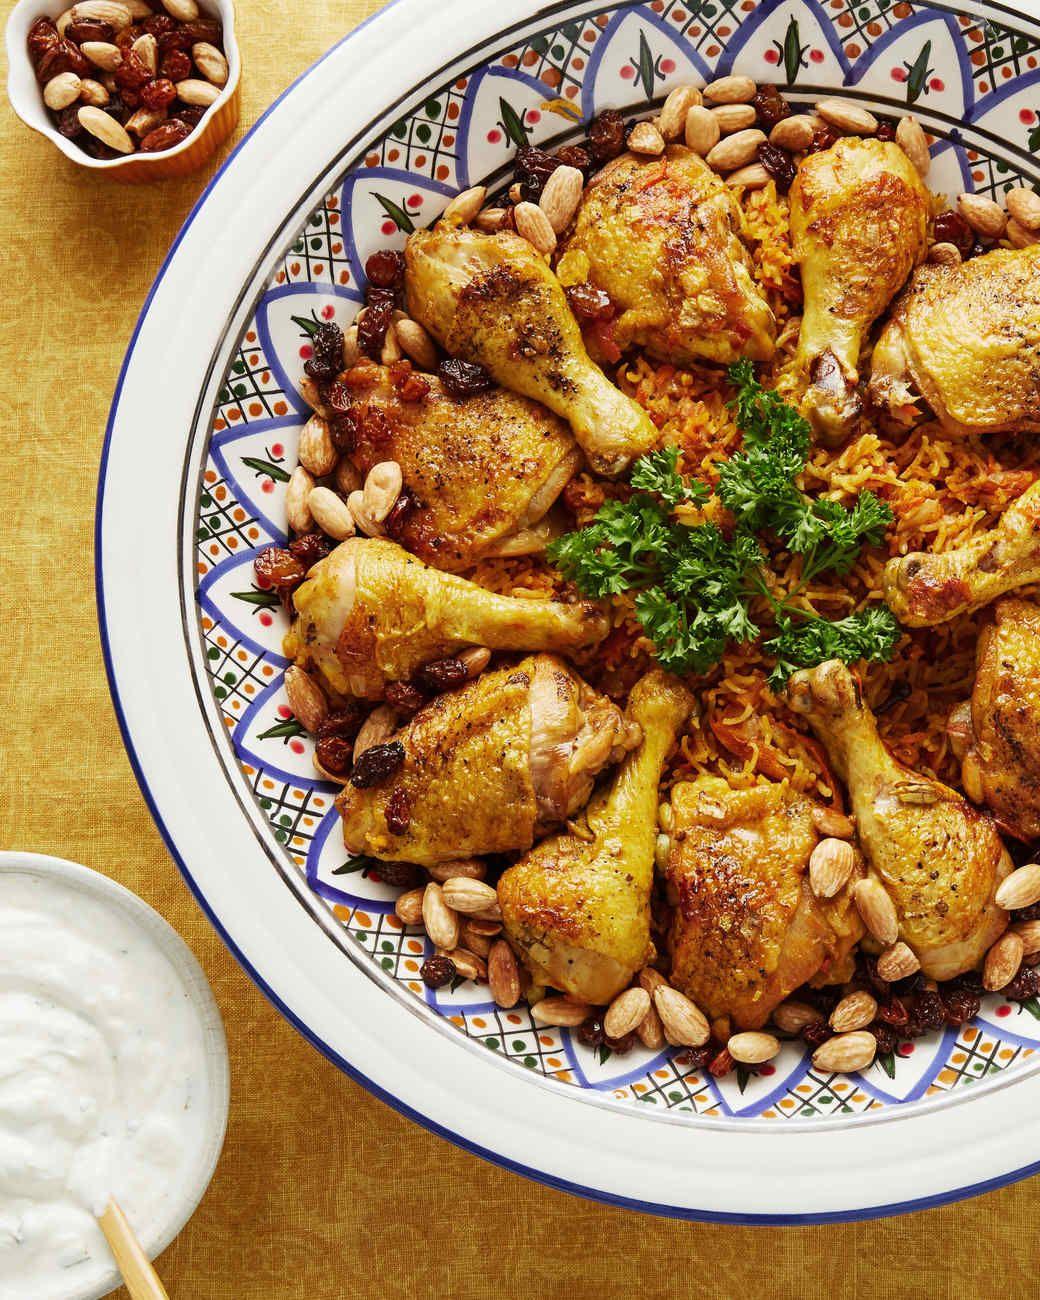 Chicken Kabsa An Ethnic Dish Very Popular In Saudi Arabia Looks Good